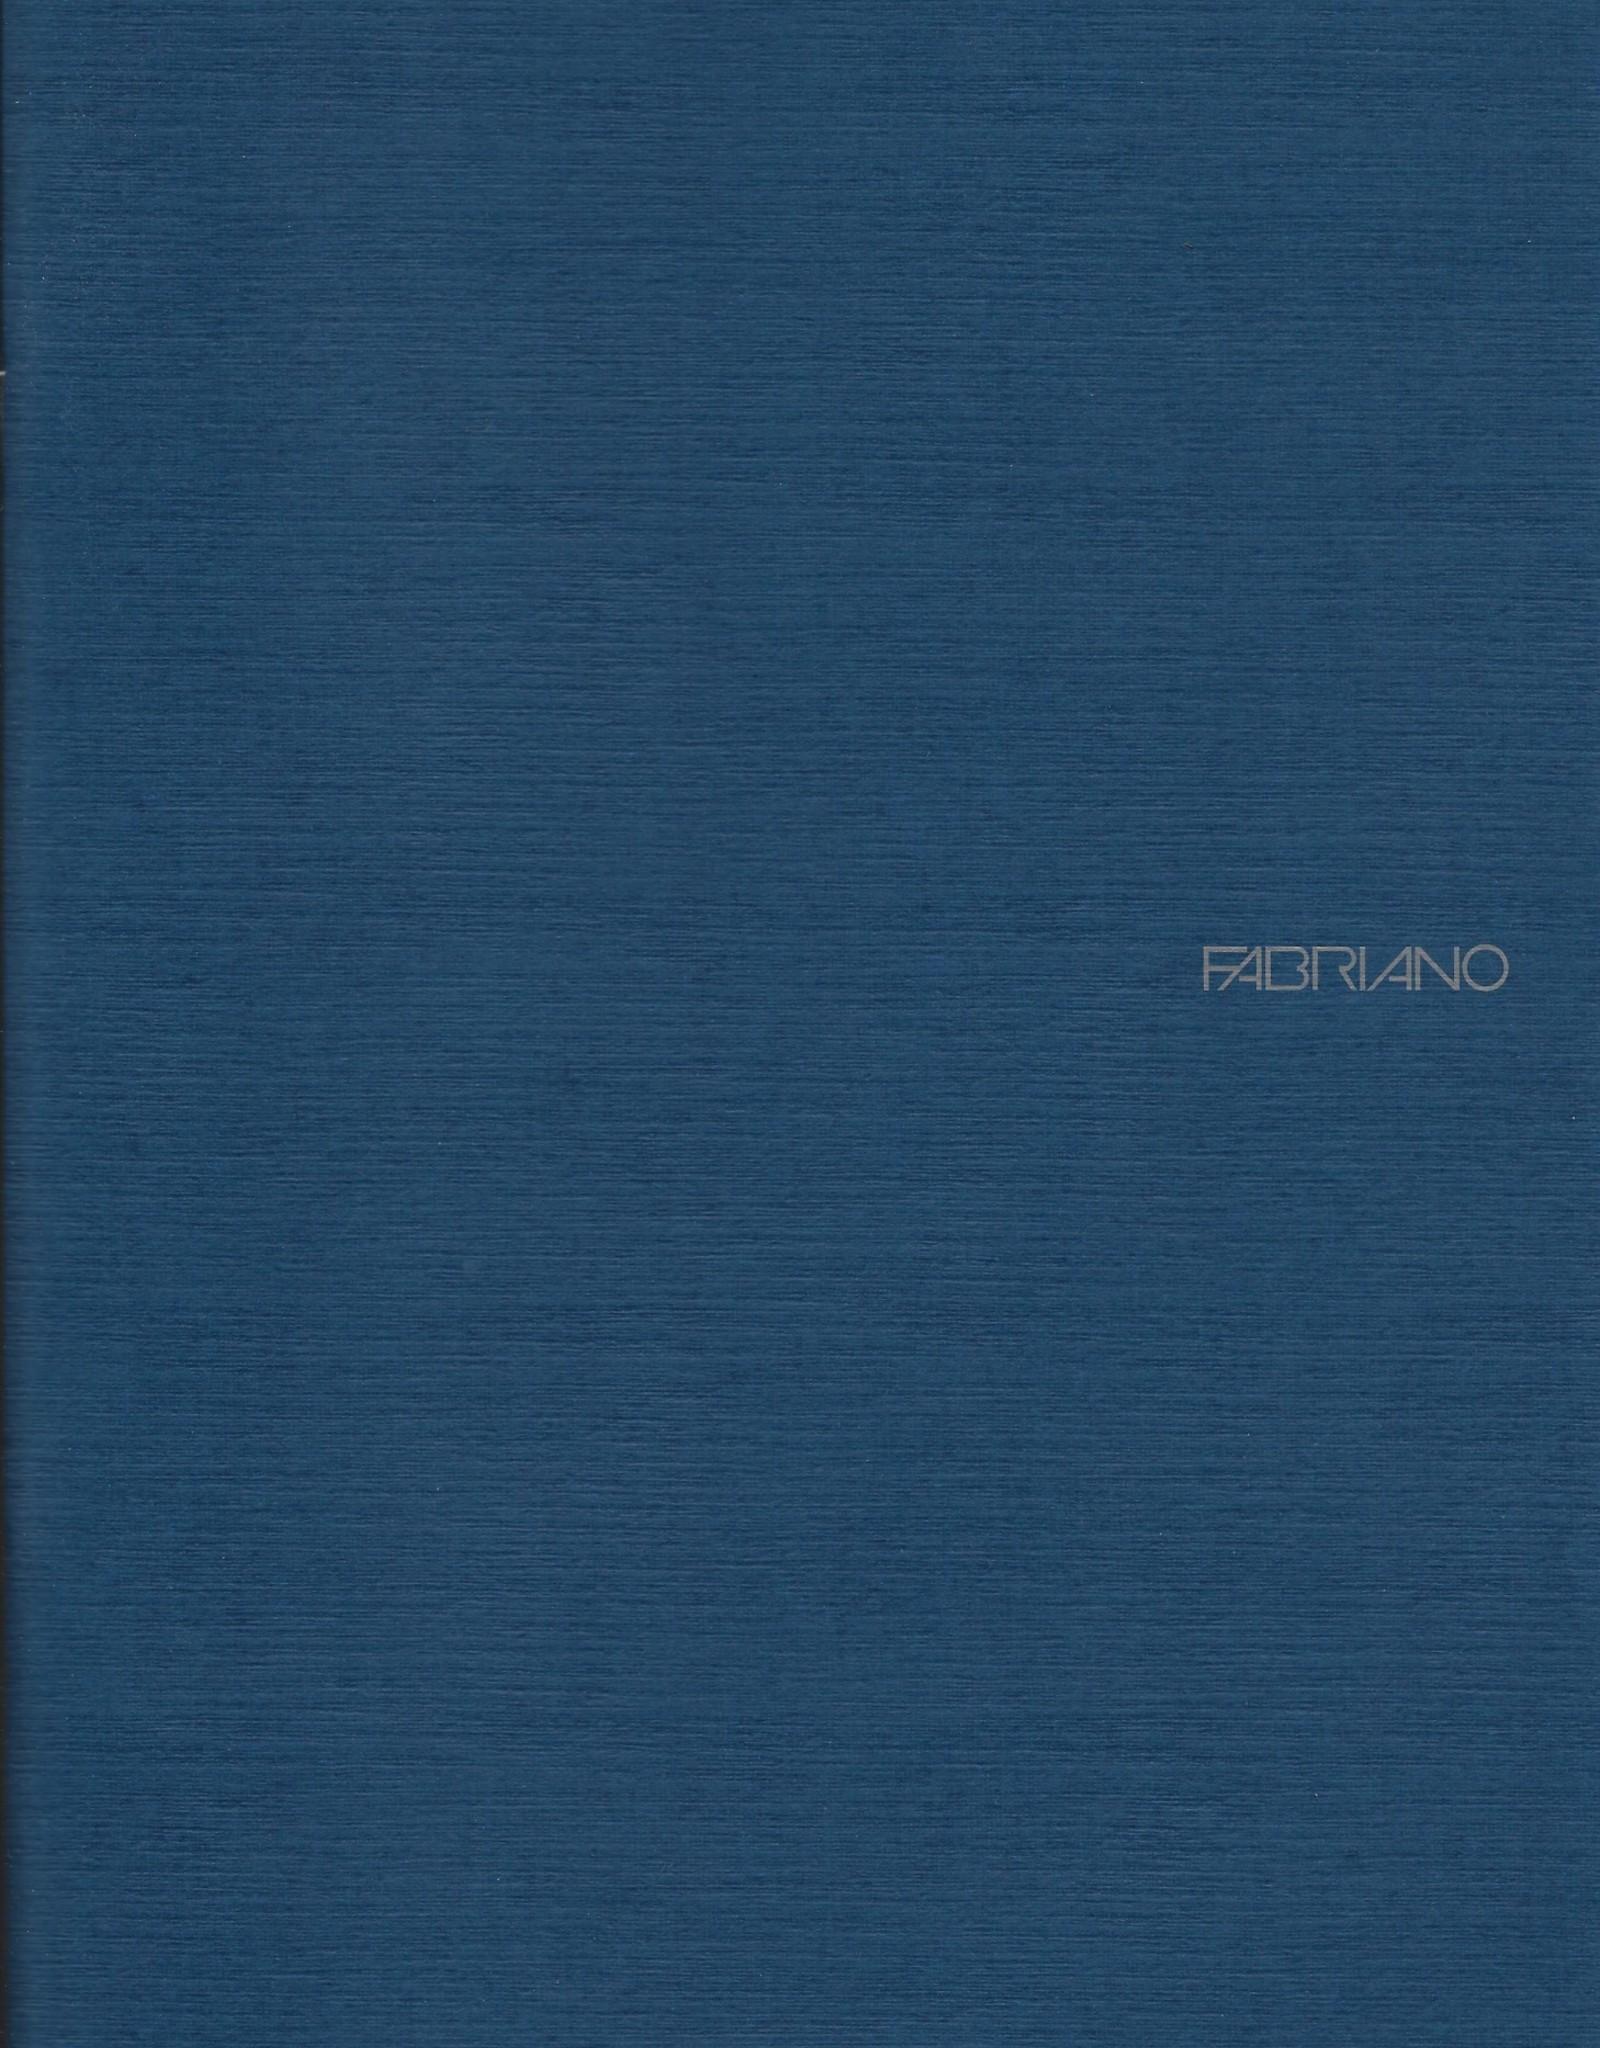 "Fabriano EcoQua Blank Notebook, Navy, 8.25"" x 11.5"" 40 Sheets"